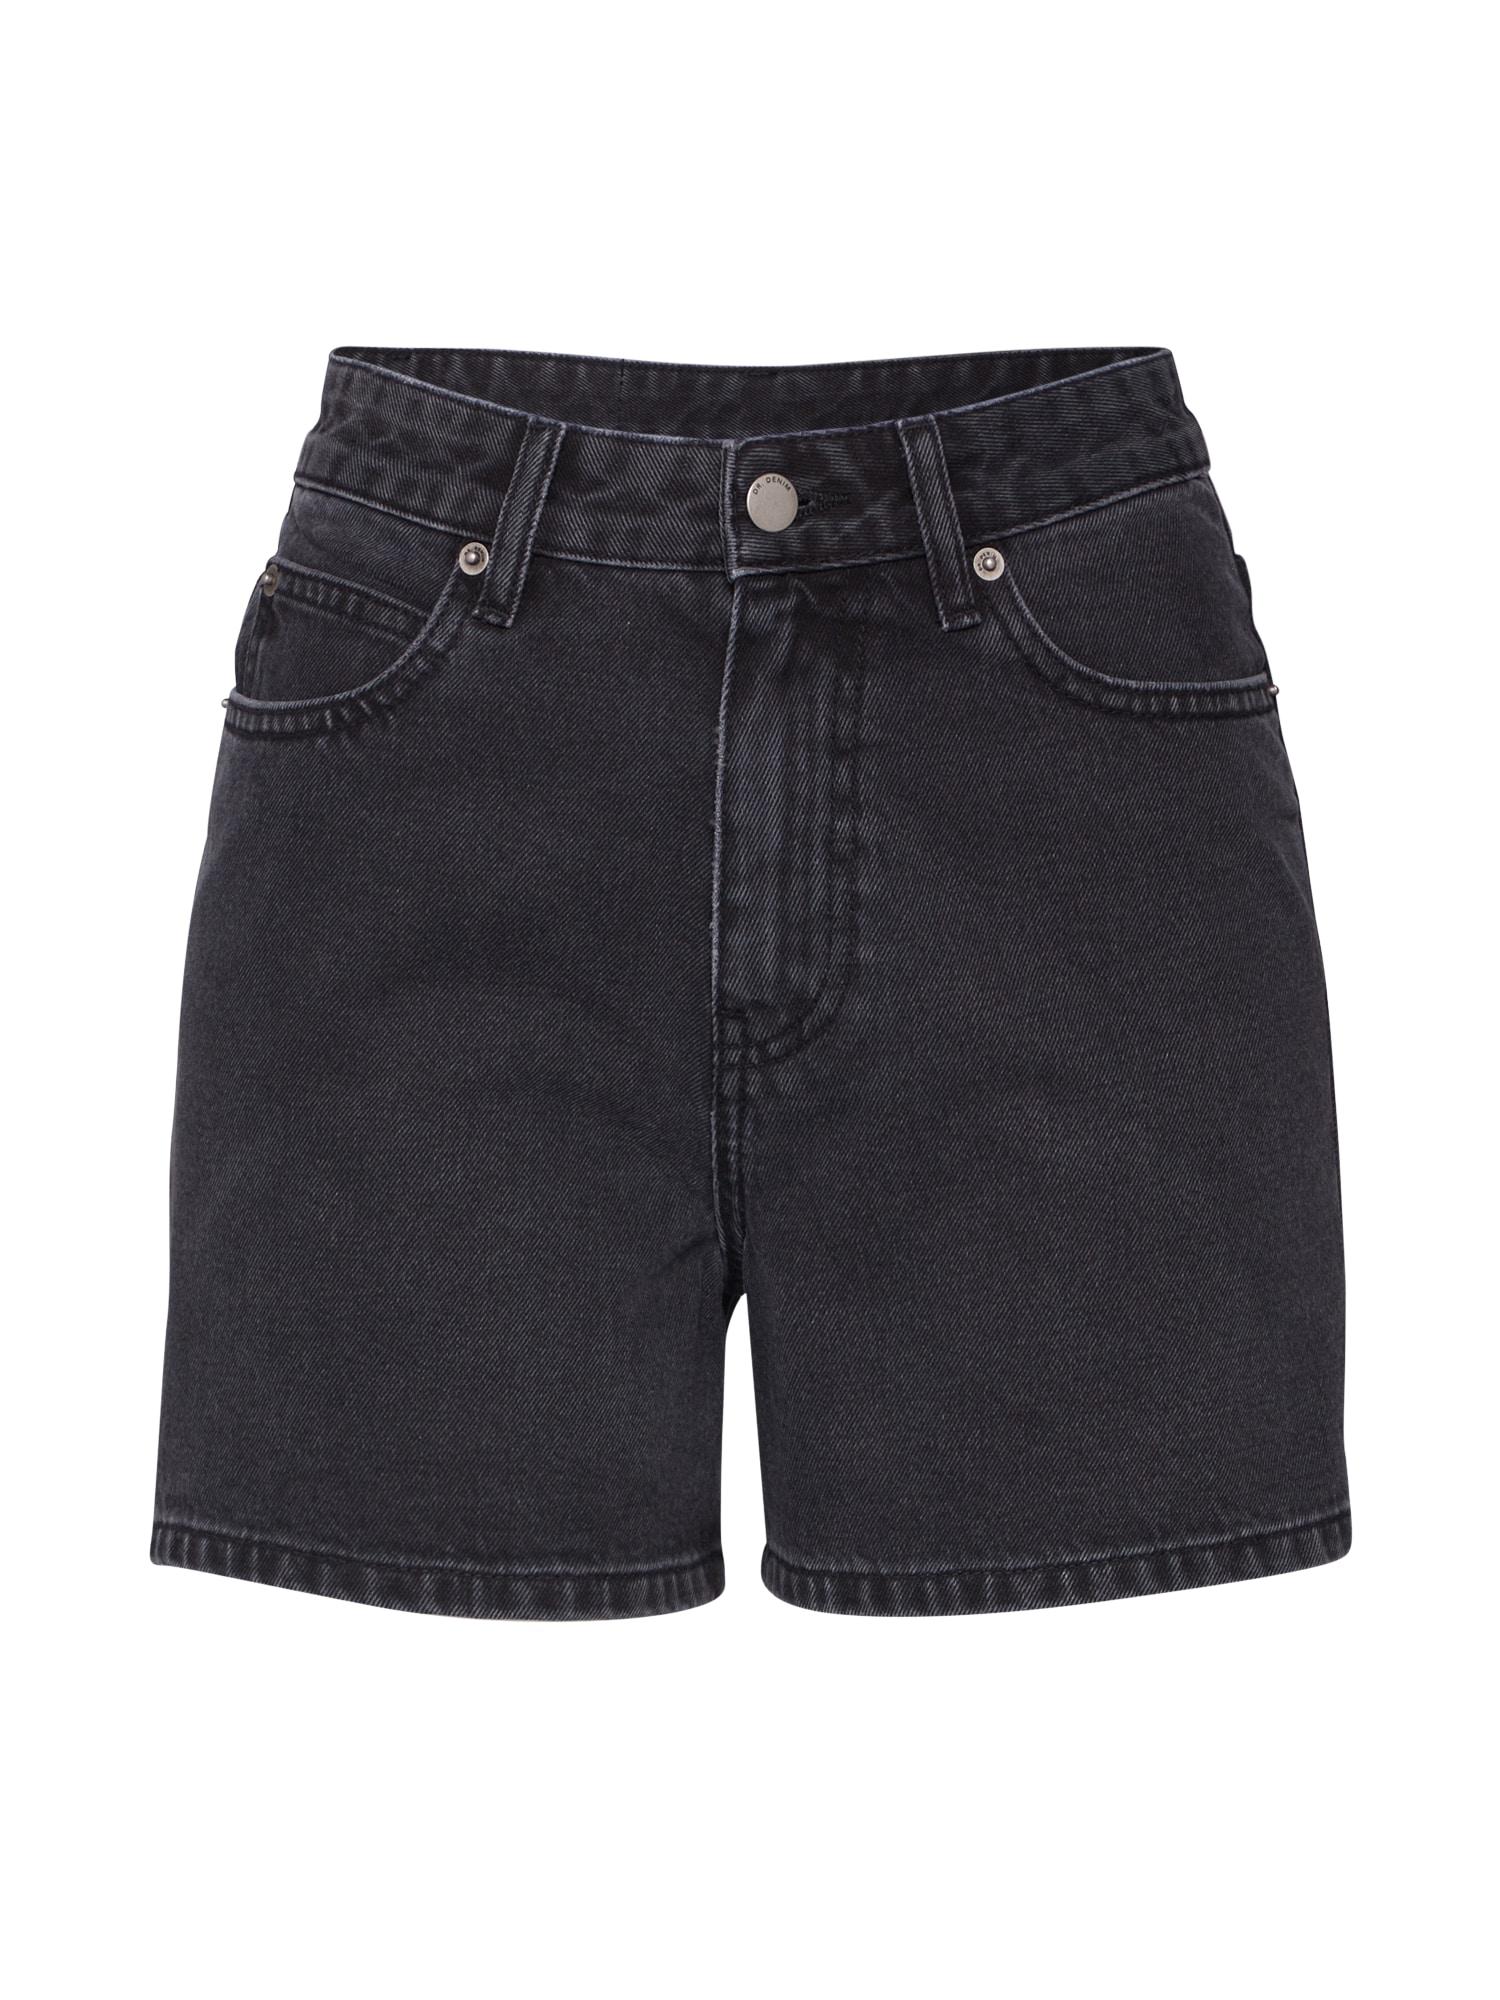 Dr. Denim Džinsai 'Jenn' juodo džinso spalva